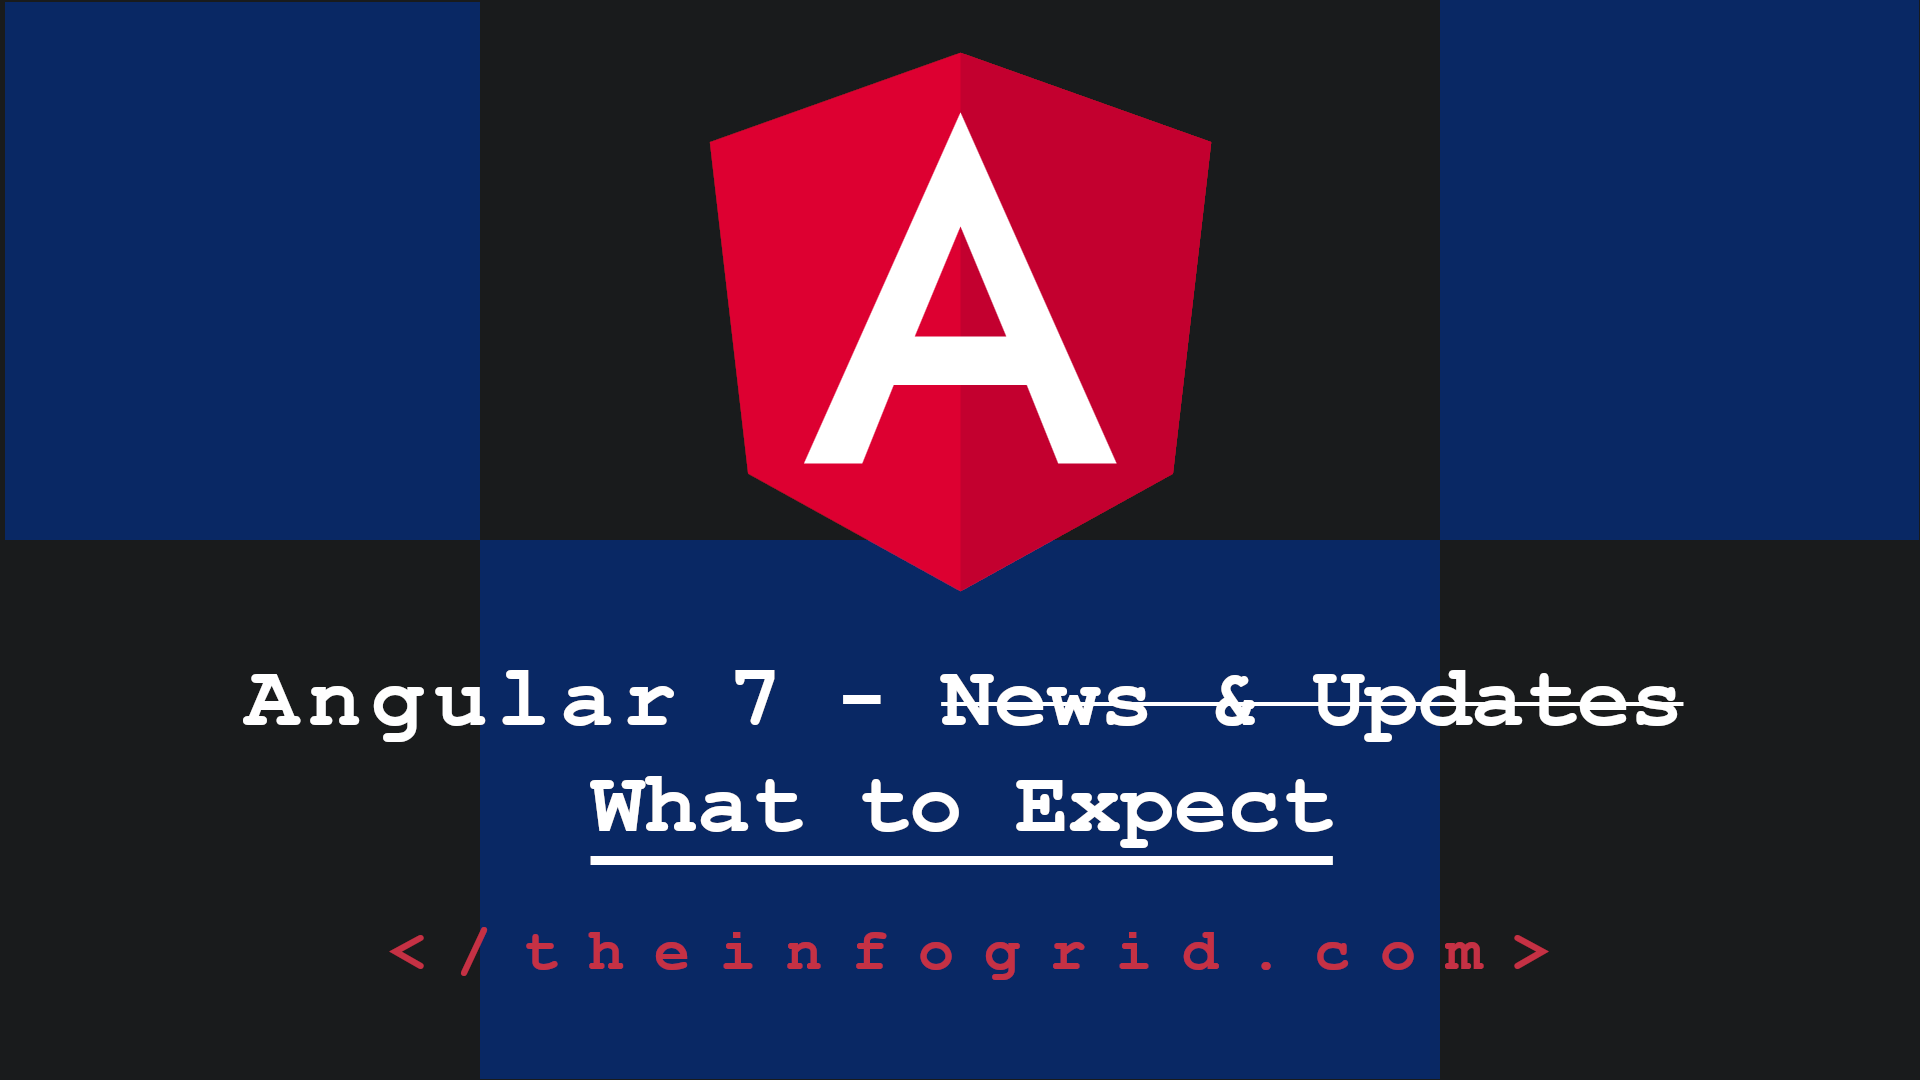 Angular 7 Spotlight – News and Updates